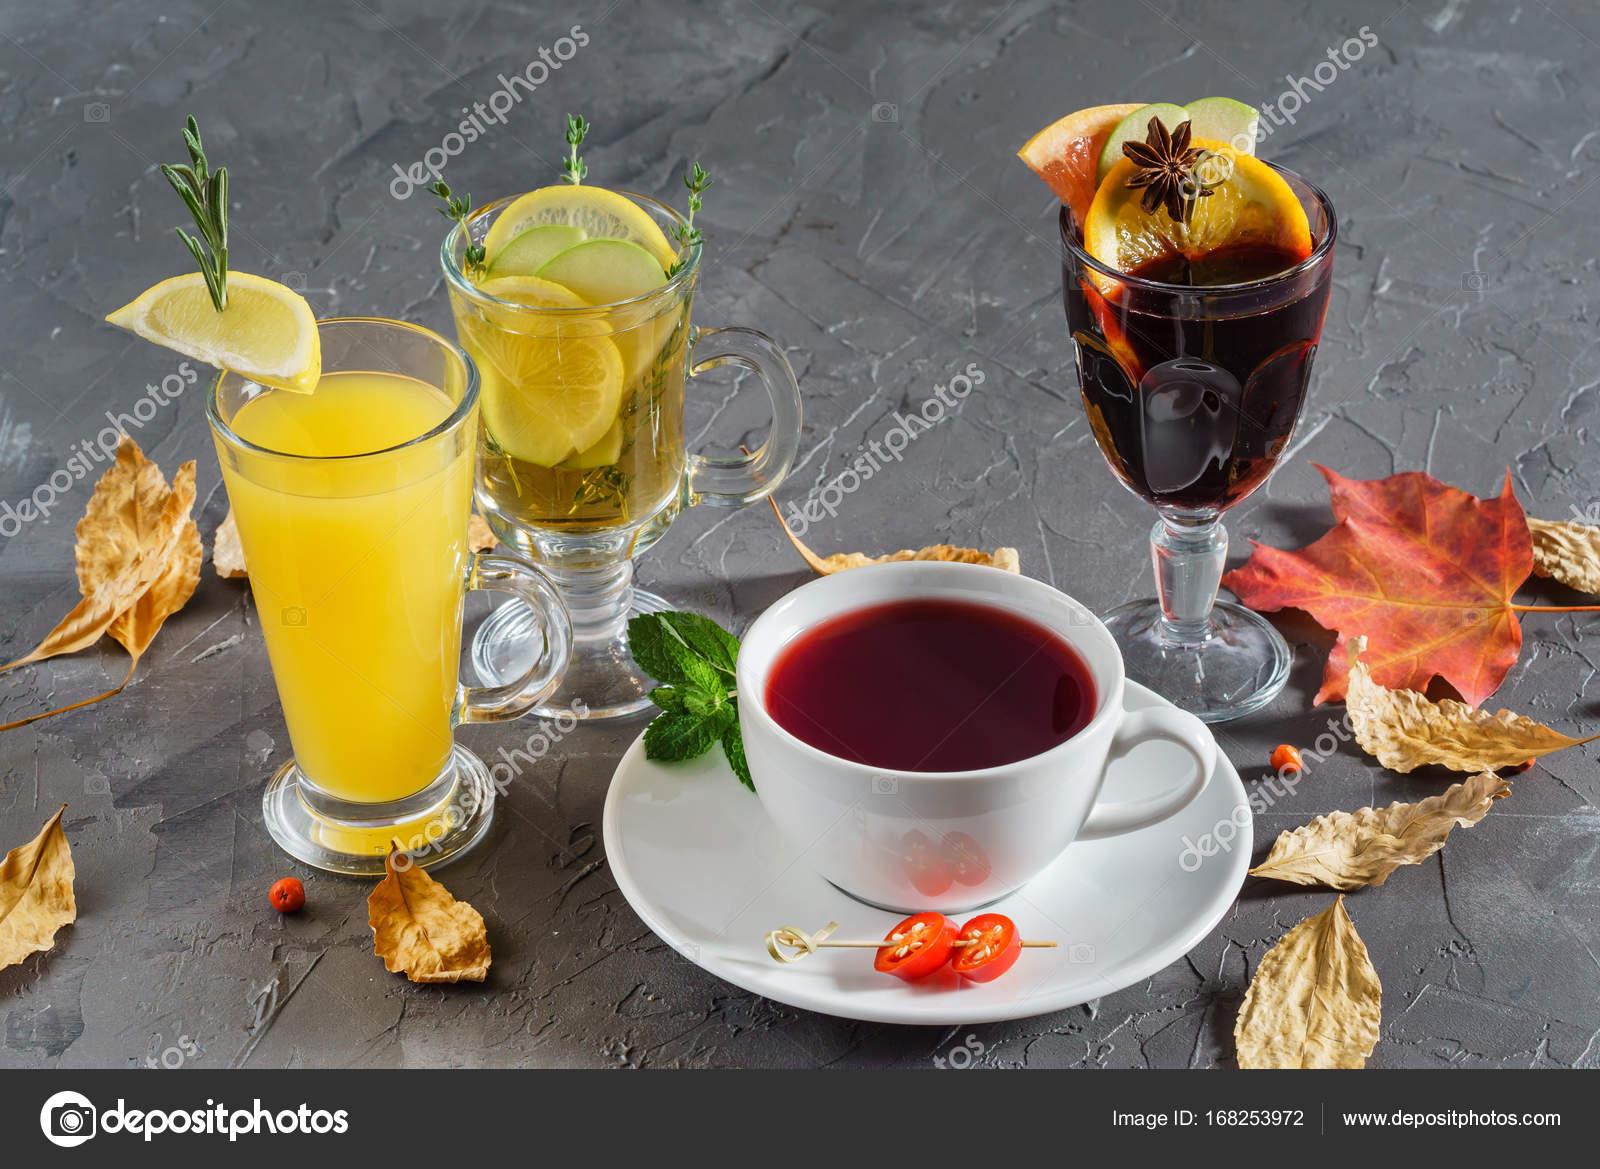 im Herbst warme Getränke — Stockfoto © Shebeko #168253972